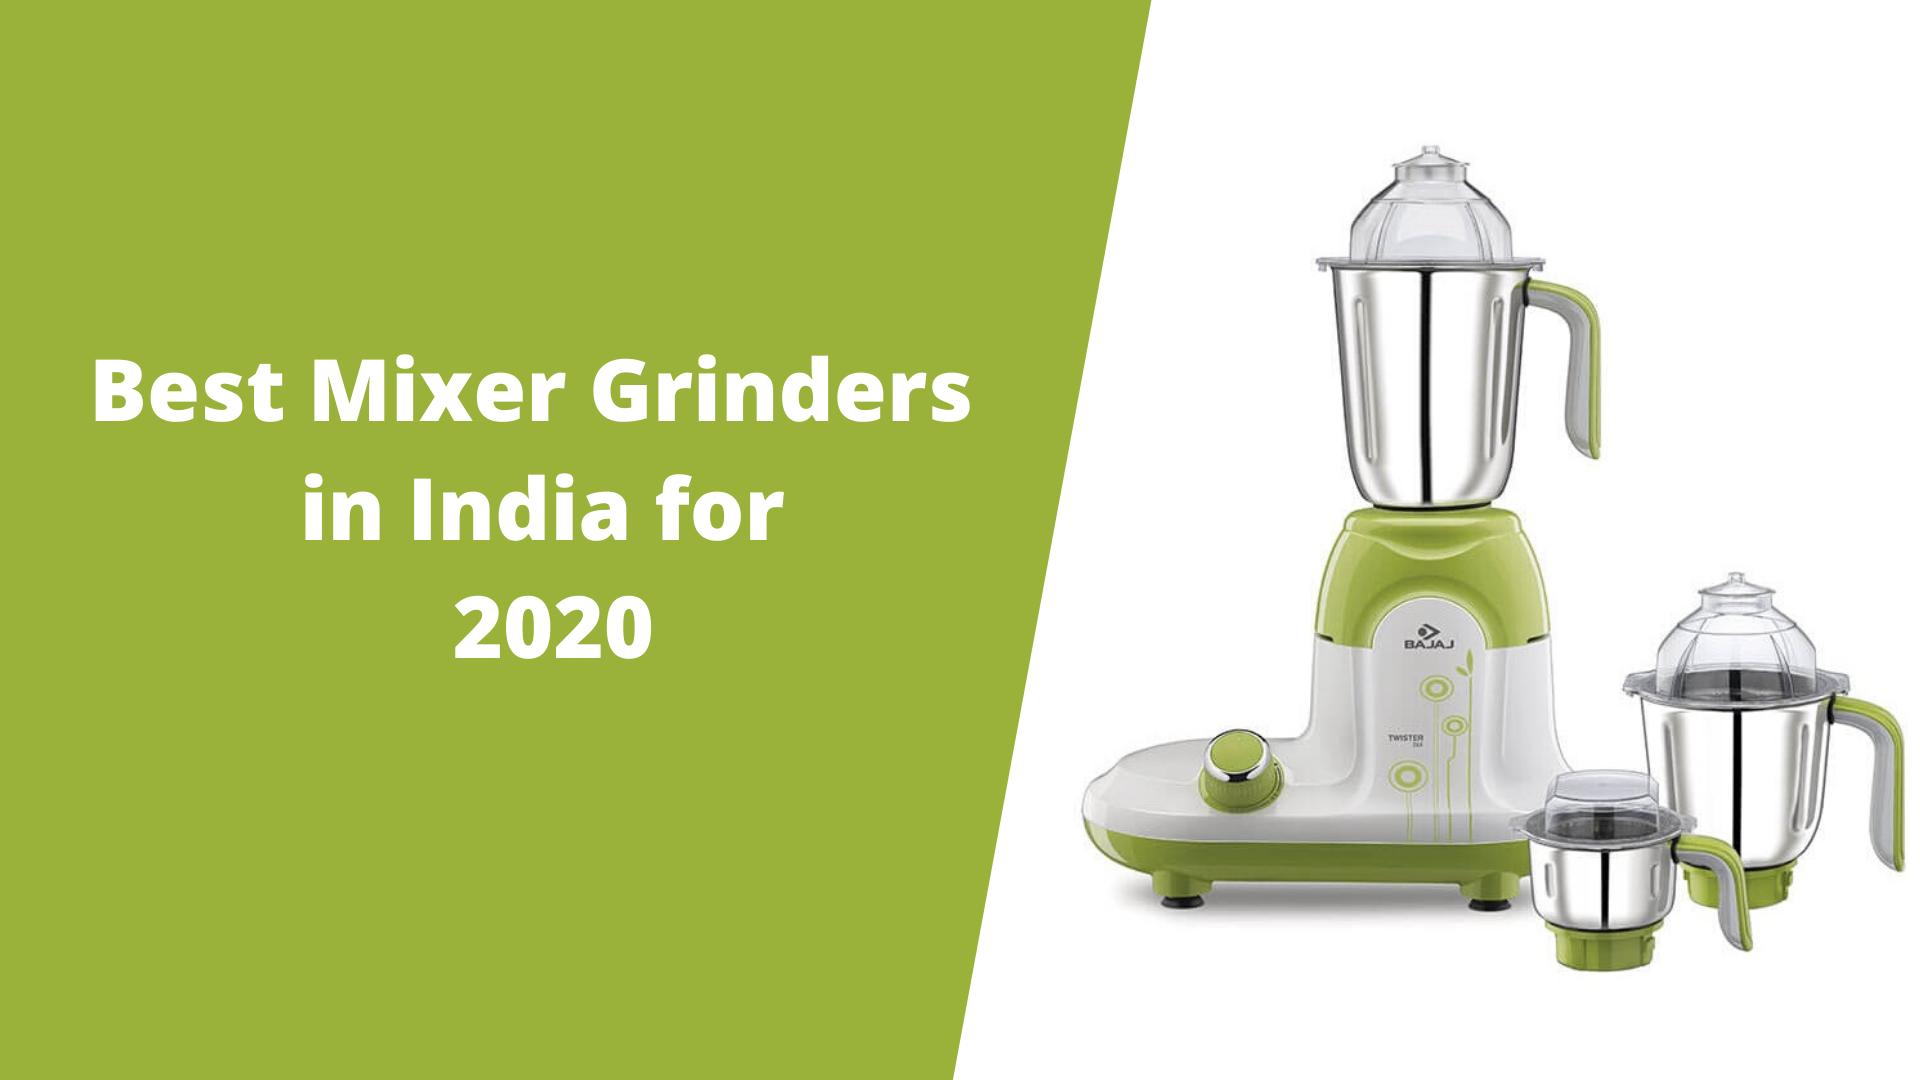 Best Mixer Grinders in India for 2021